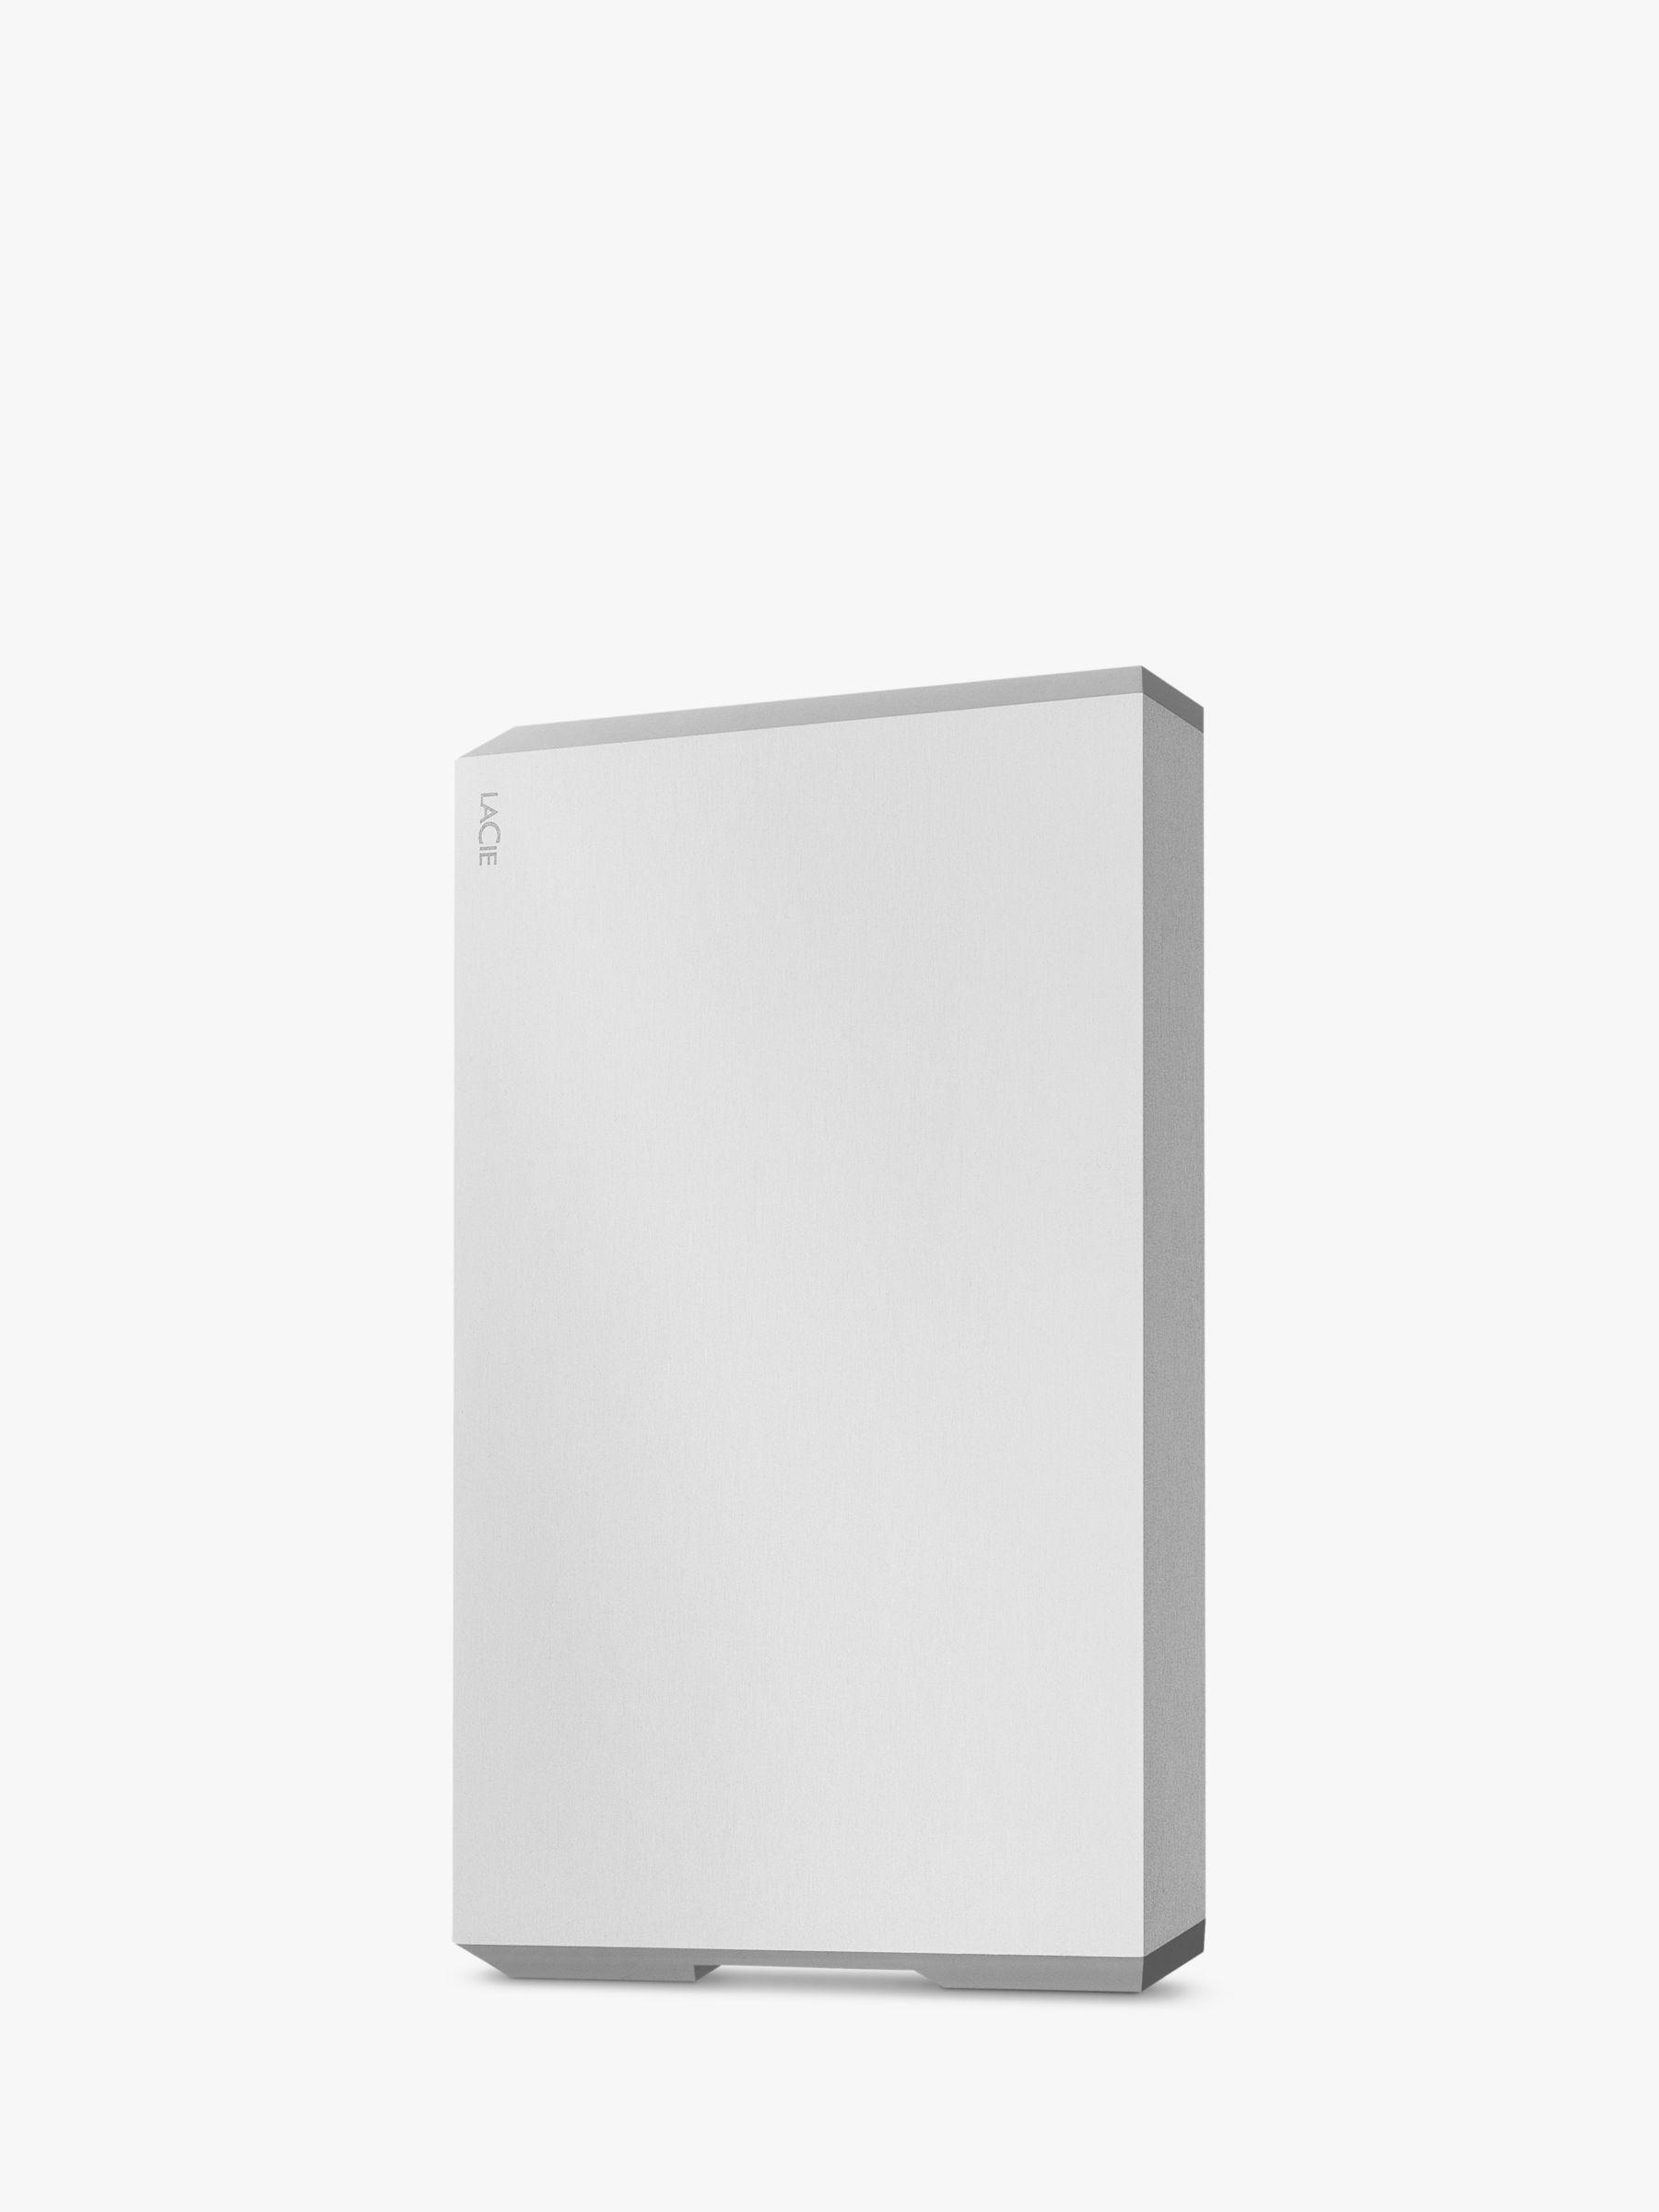 Lacie LaCie STGH1000400 External Hard Disk Drive, 1TB, USB Type-C, Silver